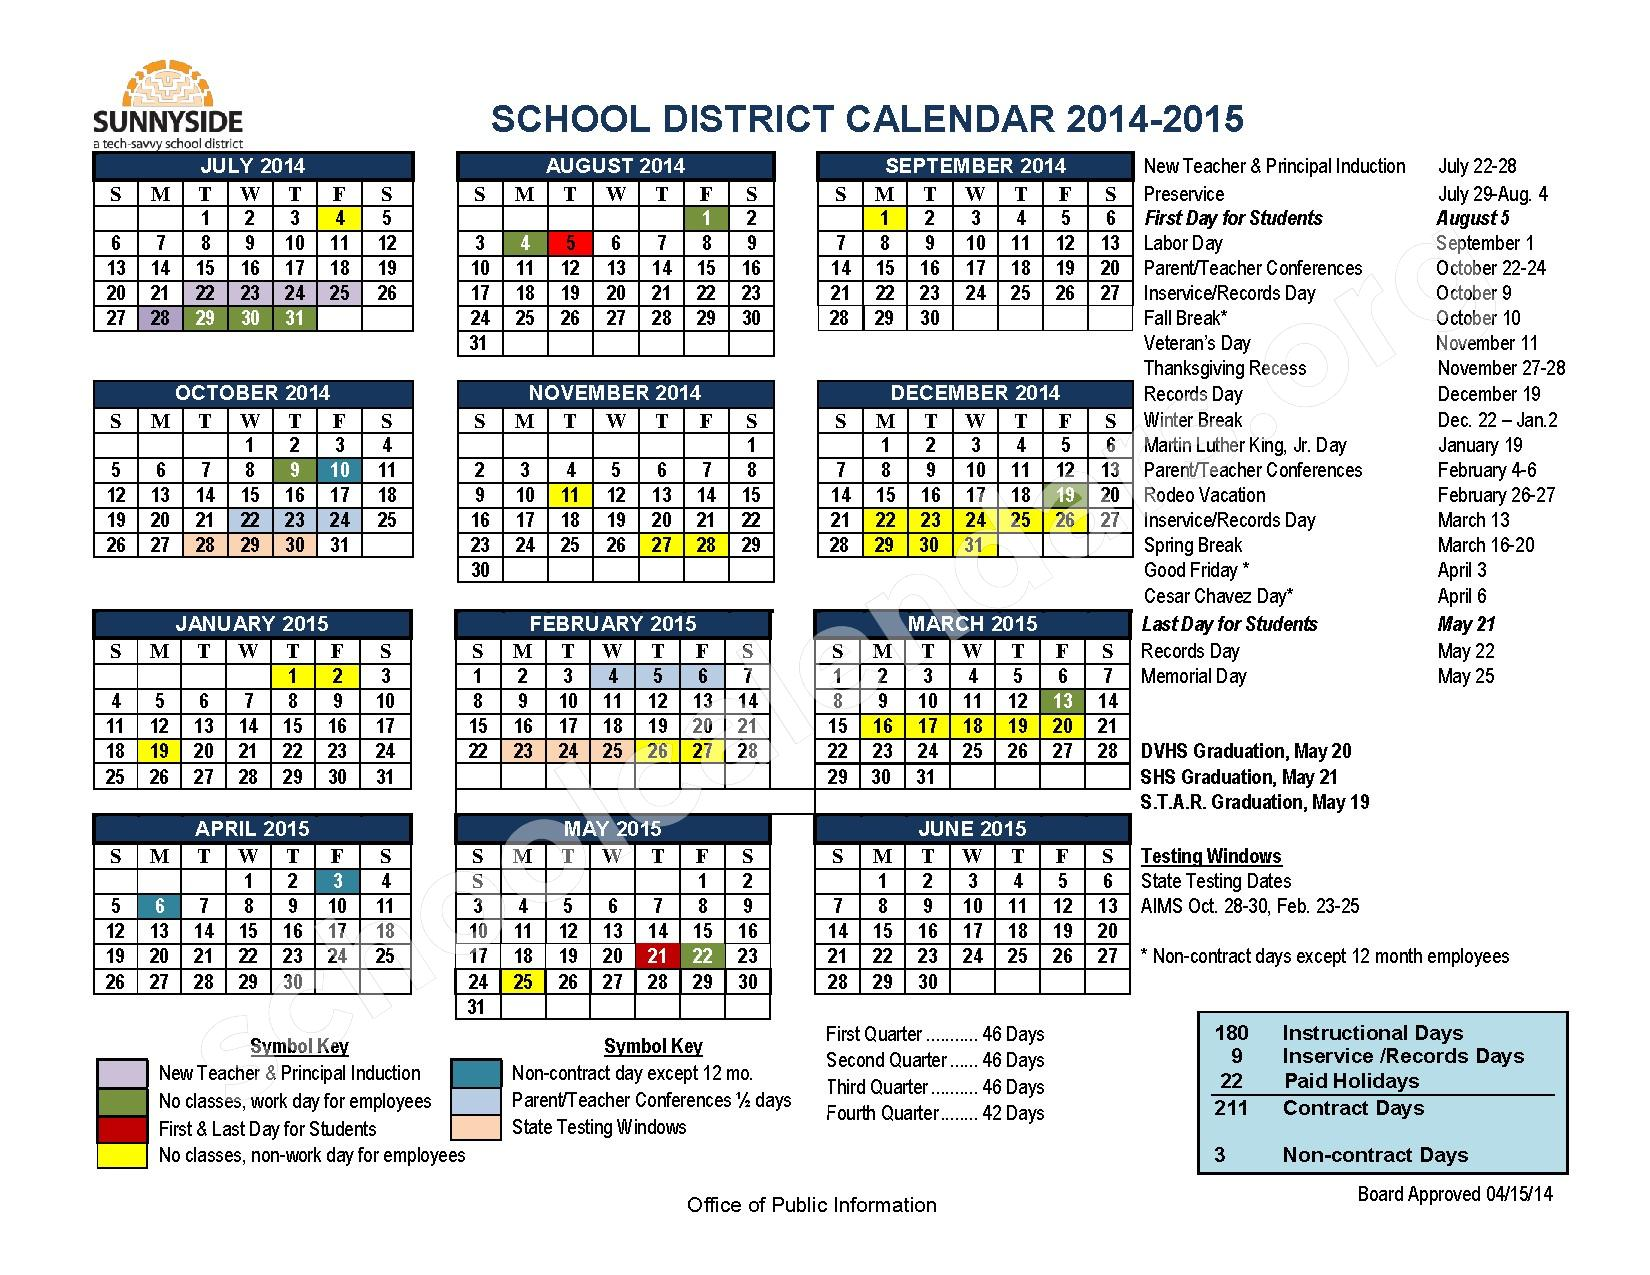 Susd Calendar 2022.S U S D S C H O O L D I S T R I C T C A L E N D A R Zonealarm Results